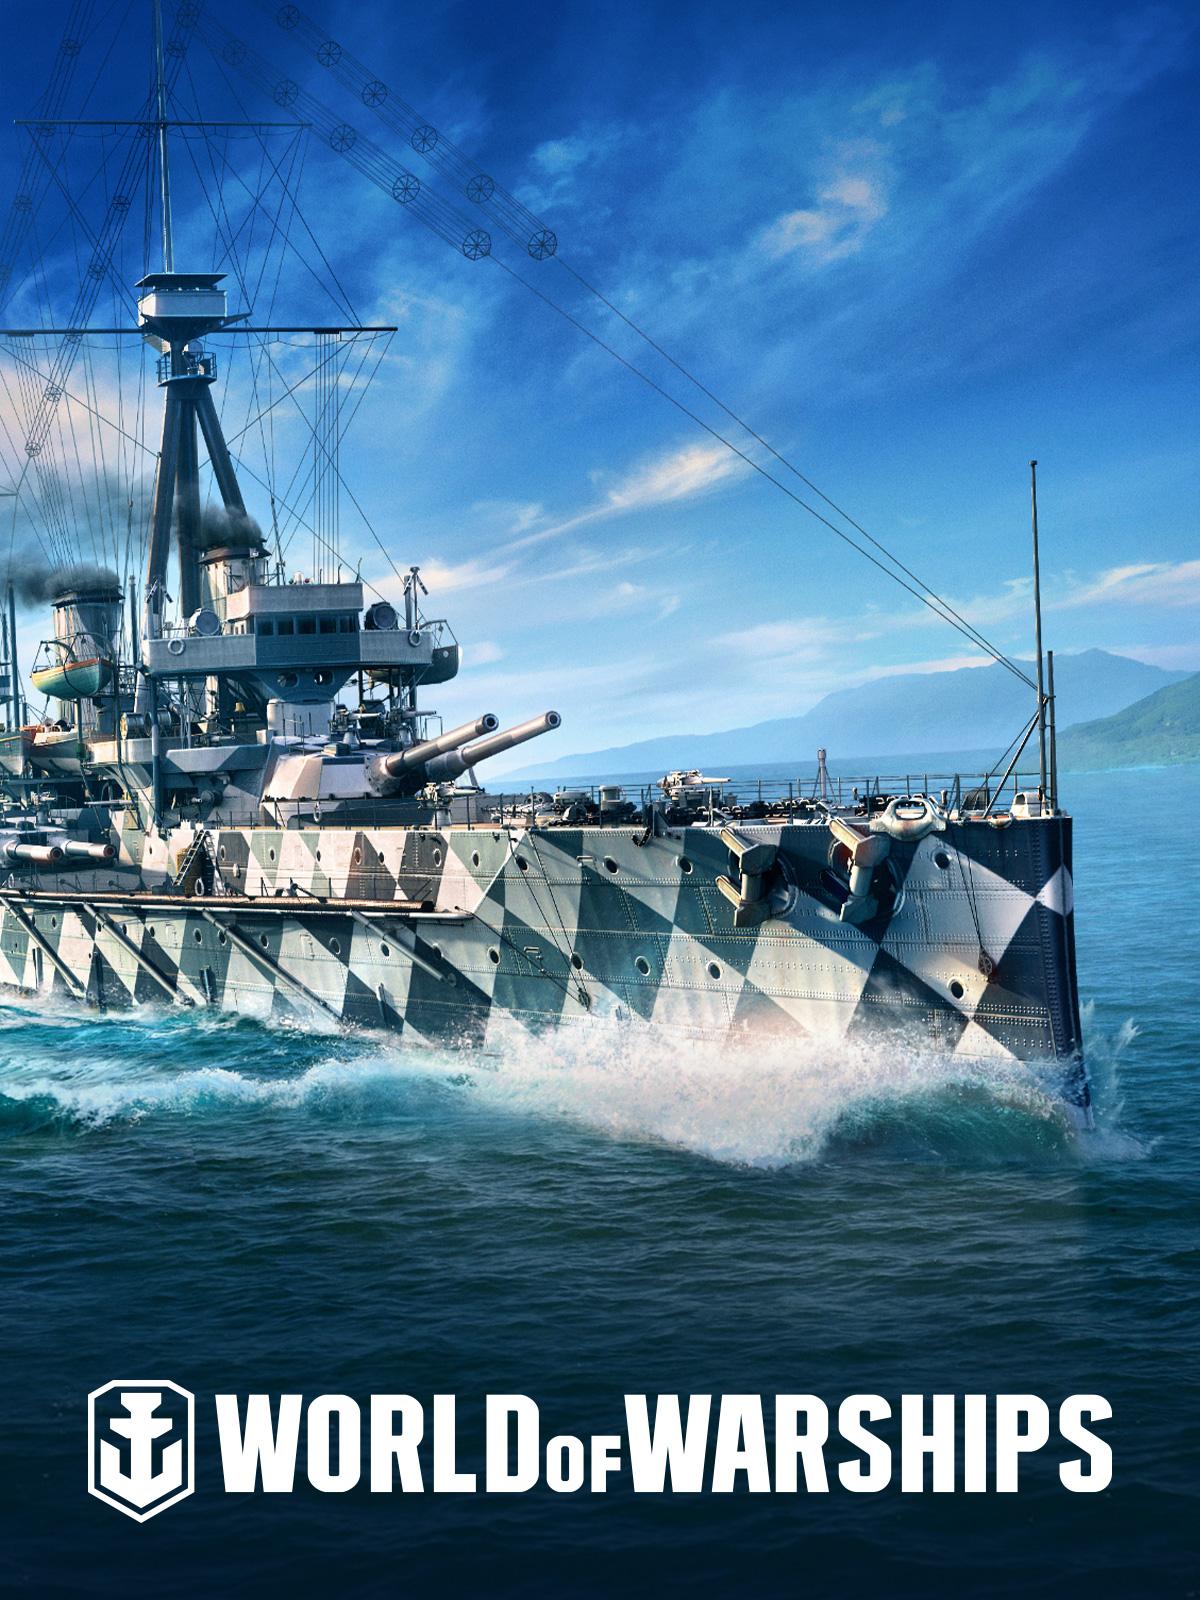 [Gratis] World of Warships exclusive starter pack @EpicGames